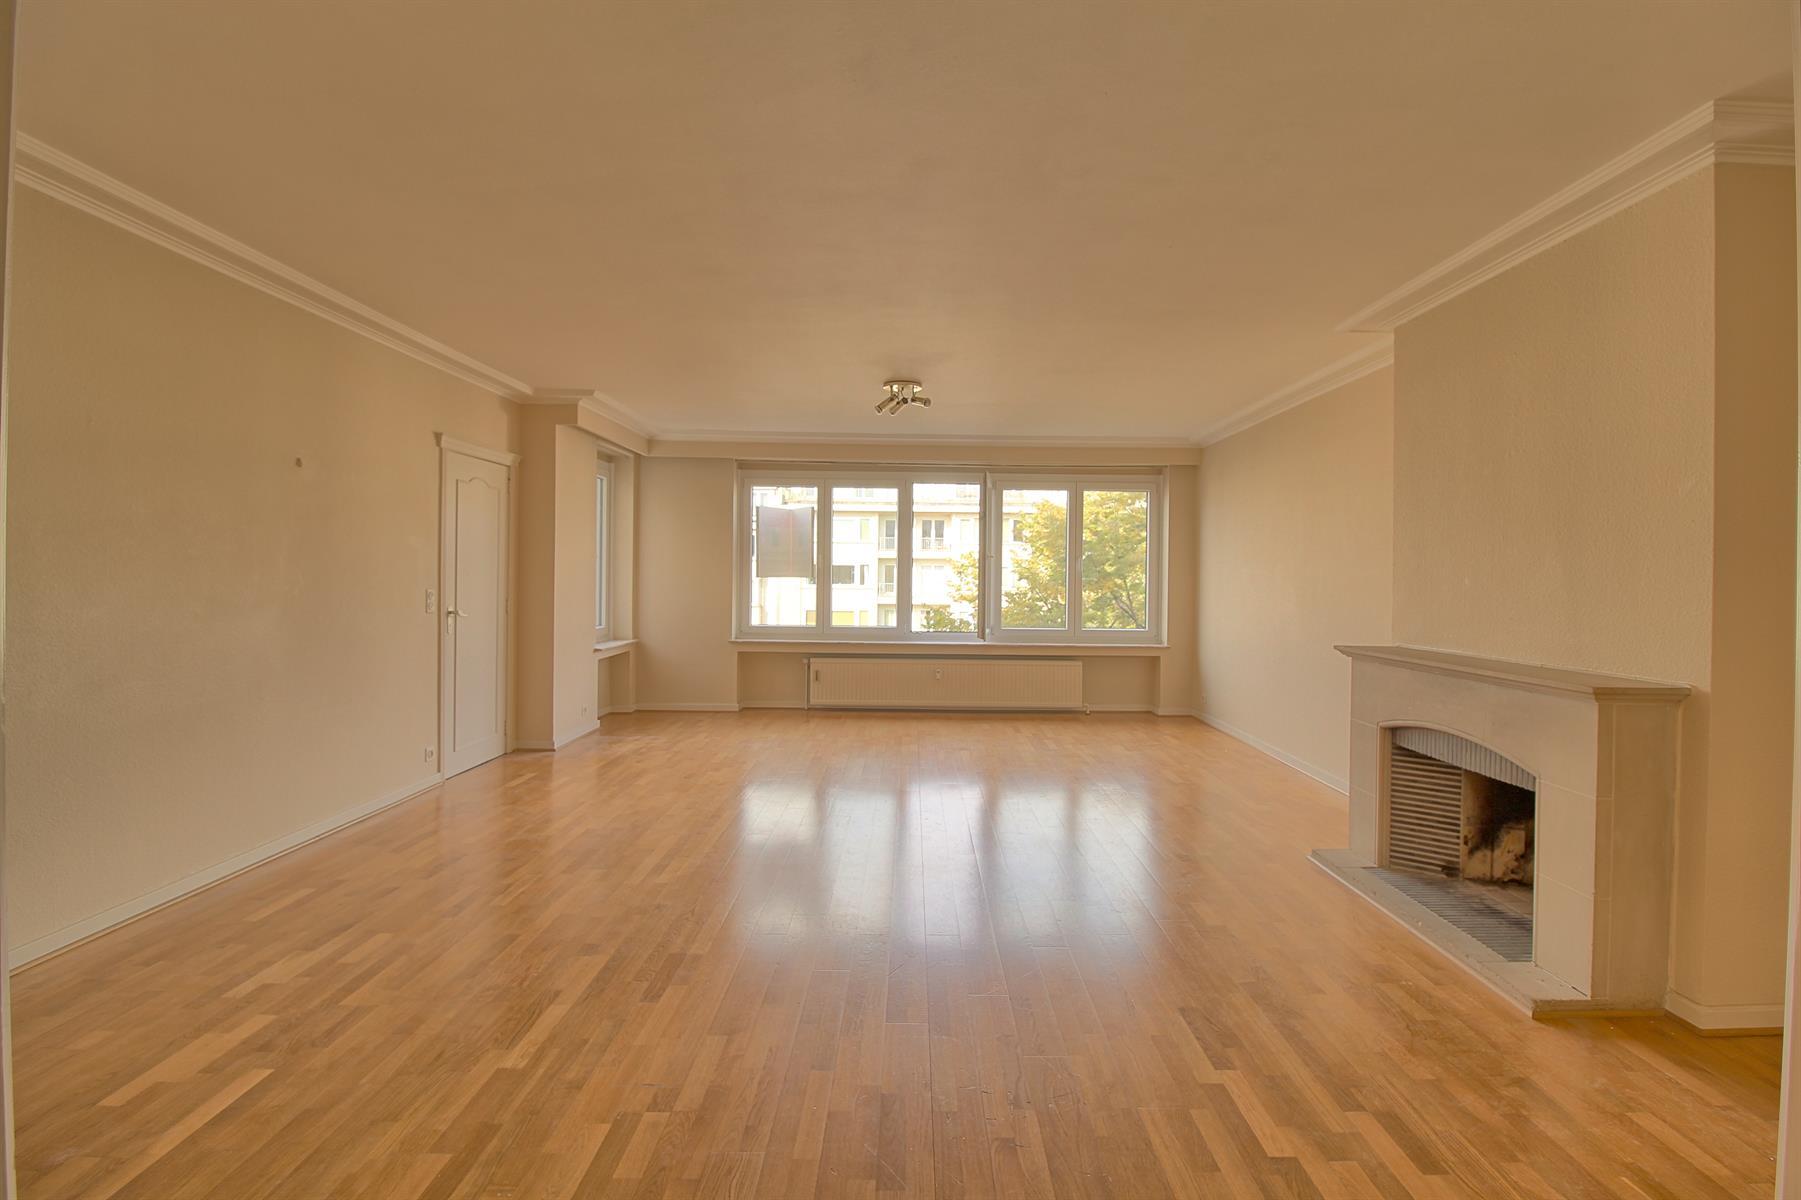 Appartement - Woluwe-Saint-Lambert - #4183448-0